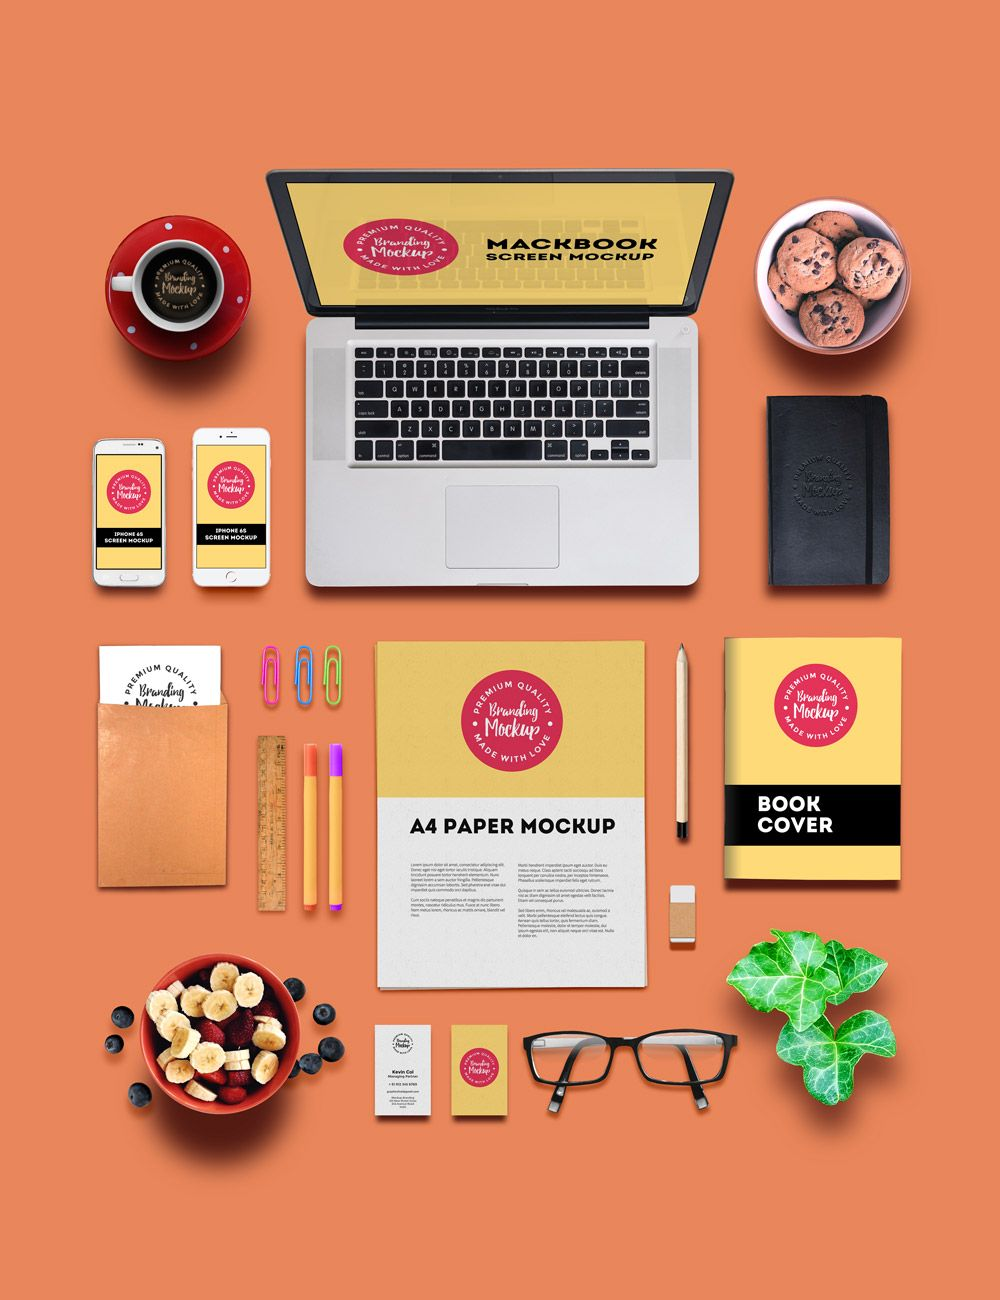 Branding and Identity Mockup Graphic design brochure, Mockup